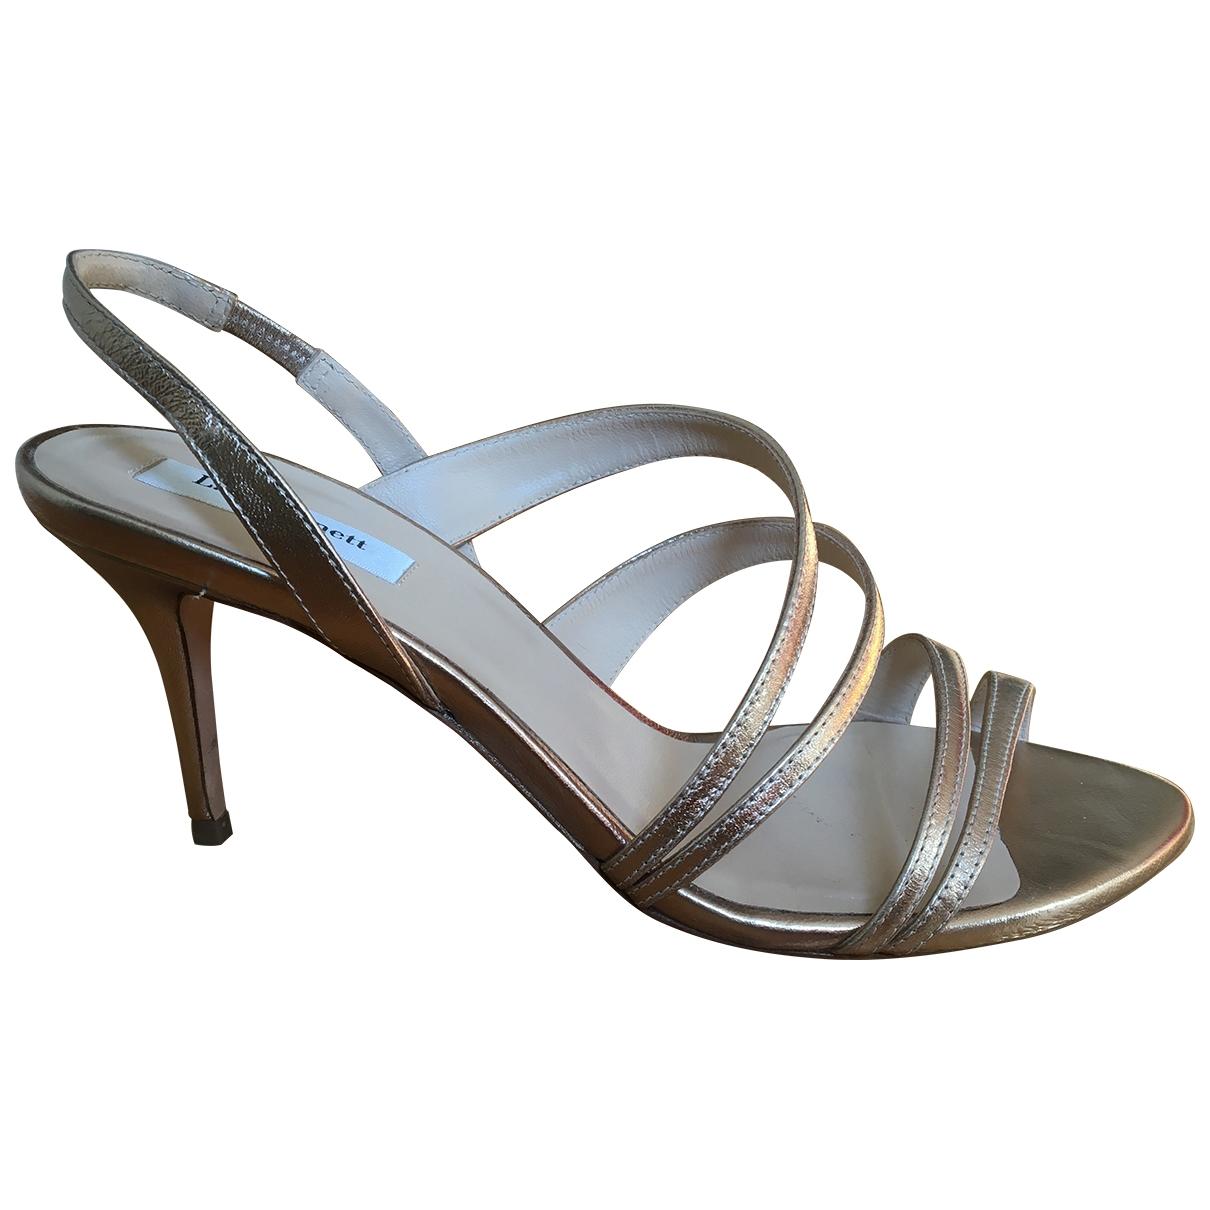 Lk Bennett \N Gold Leather Heels for Women 40 EU